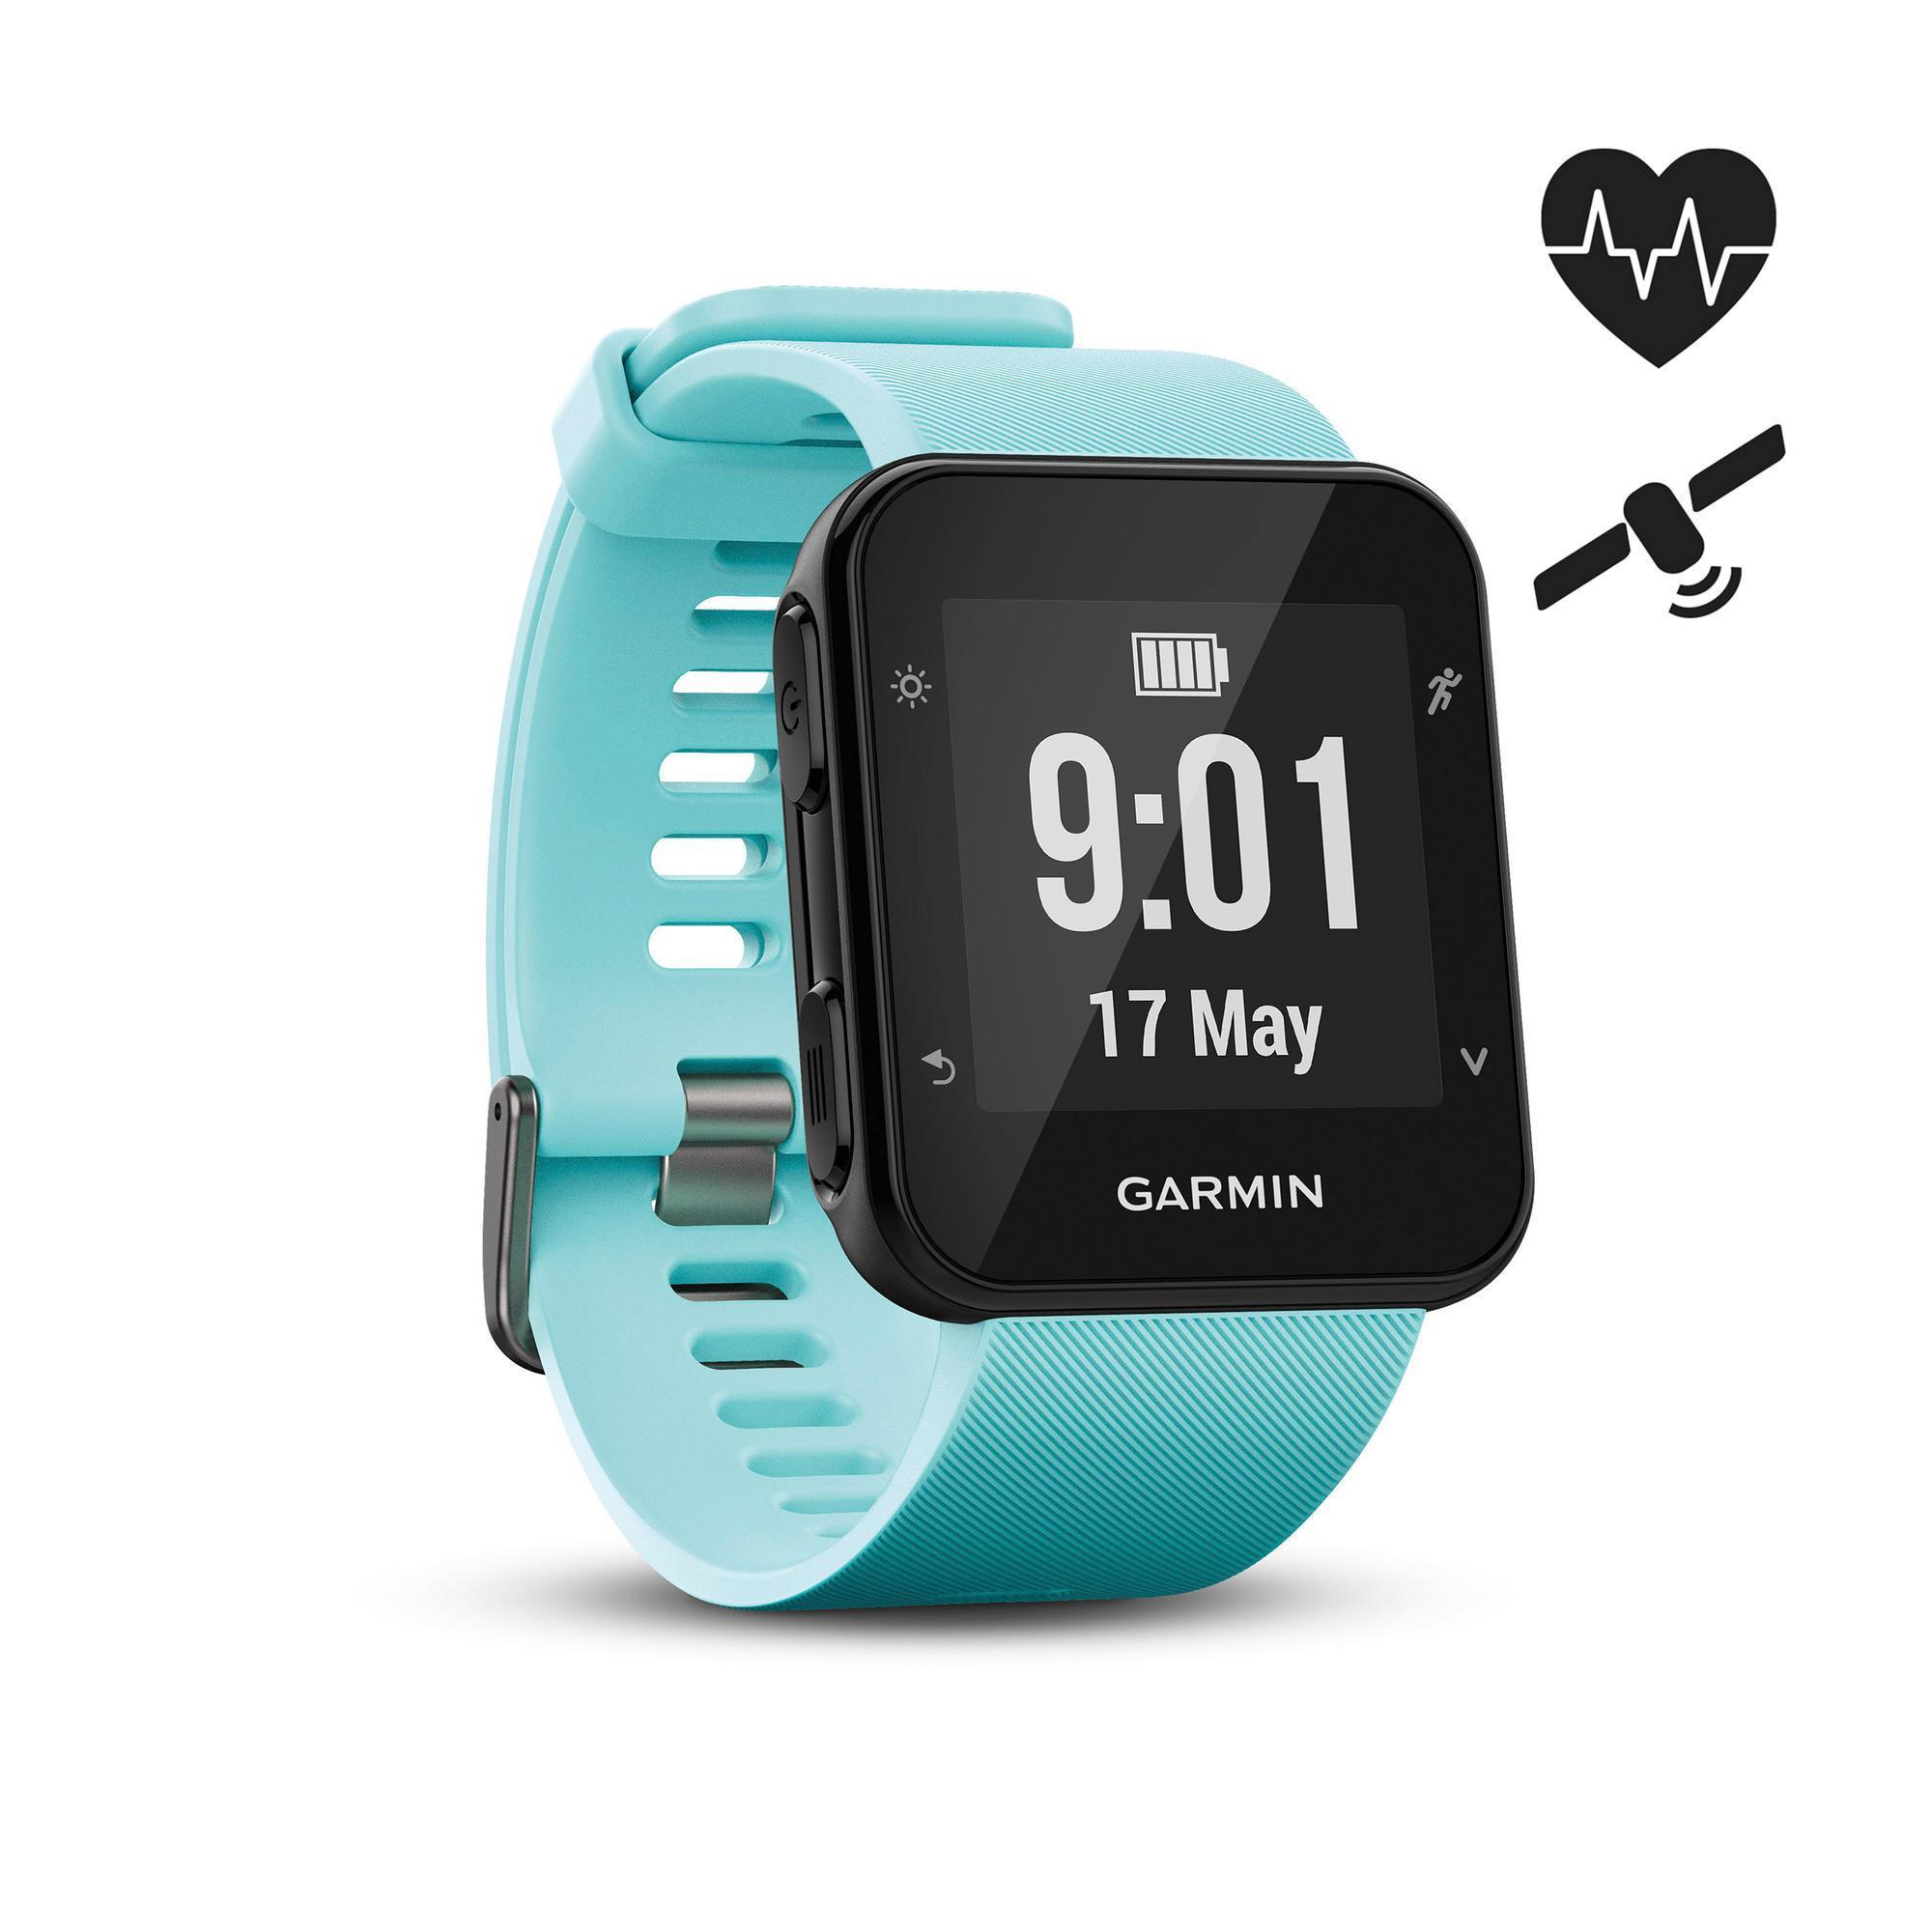 84cd52d90d20 Reloj GPS Pulsómtro Muñeca Running Garmin Forerunner 35 Verde Agua Garmin